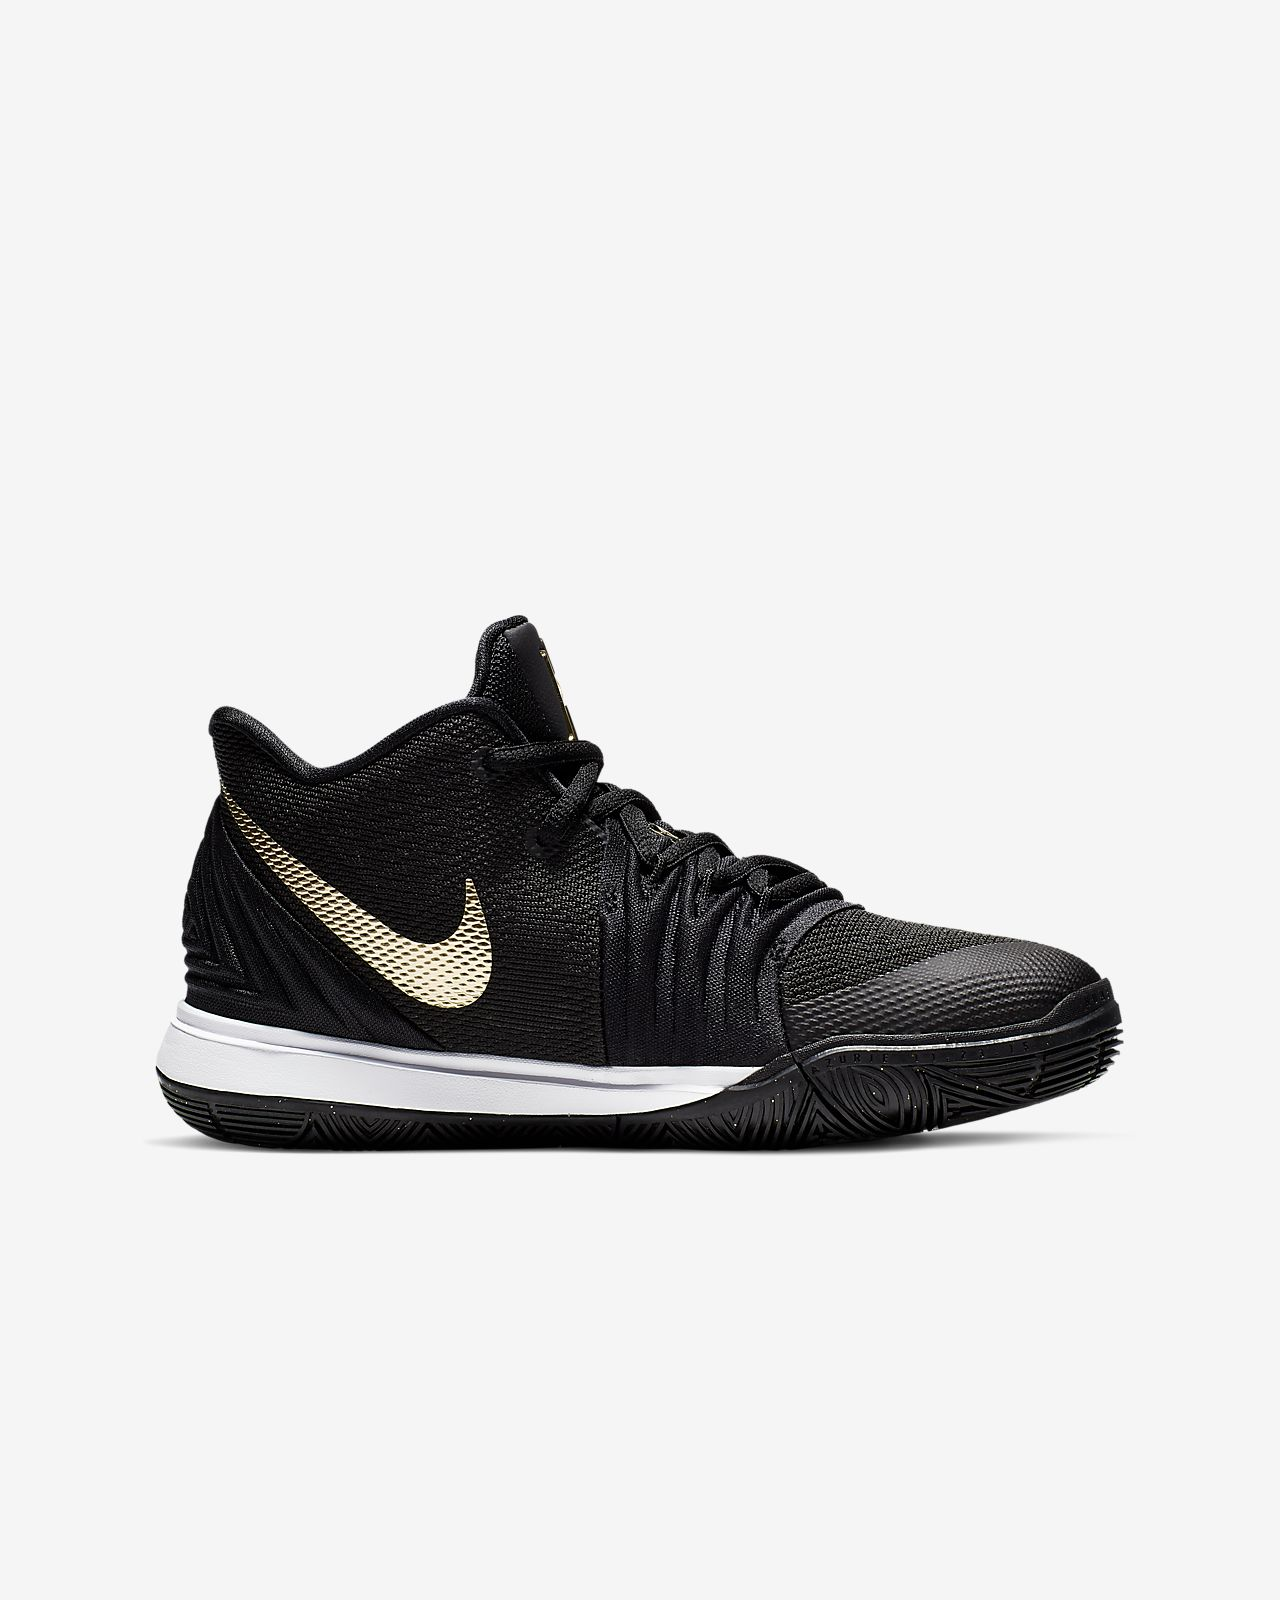 751ead300c5 Kyrie 5 Big Kids' Shoe. Nike.com